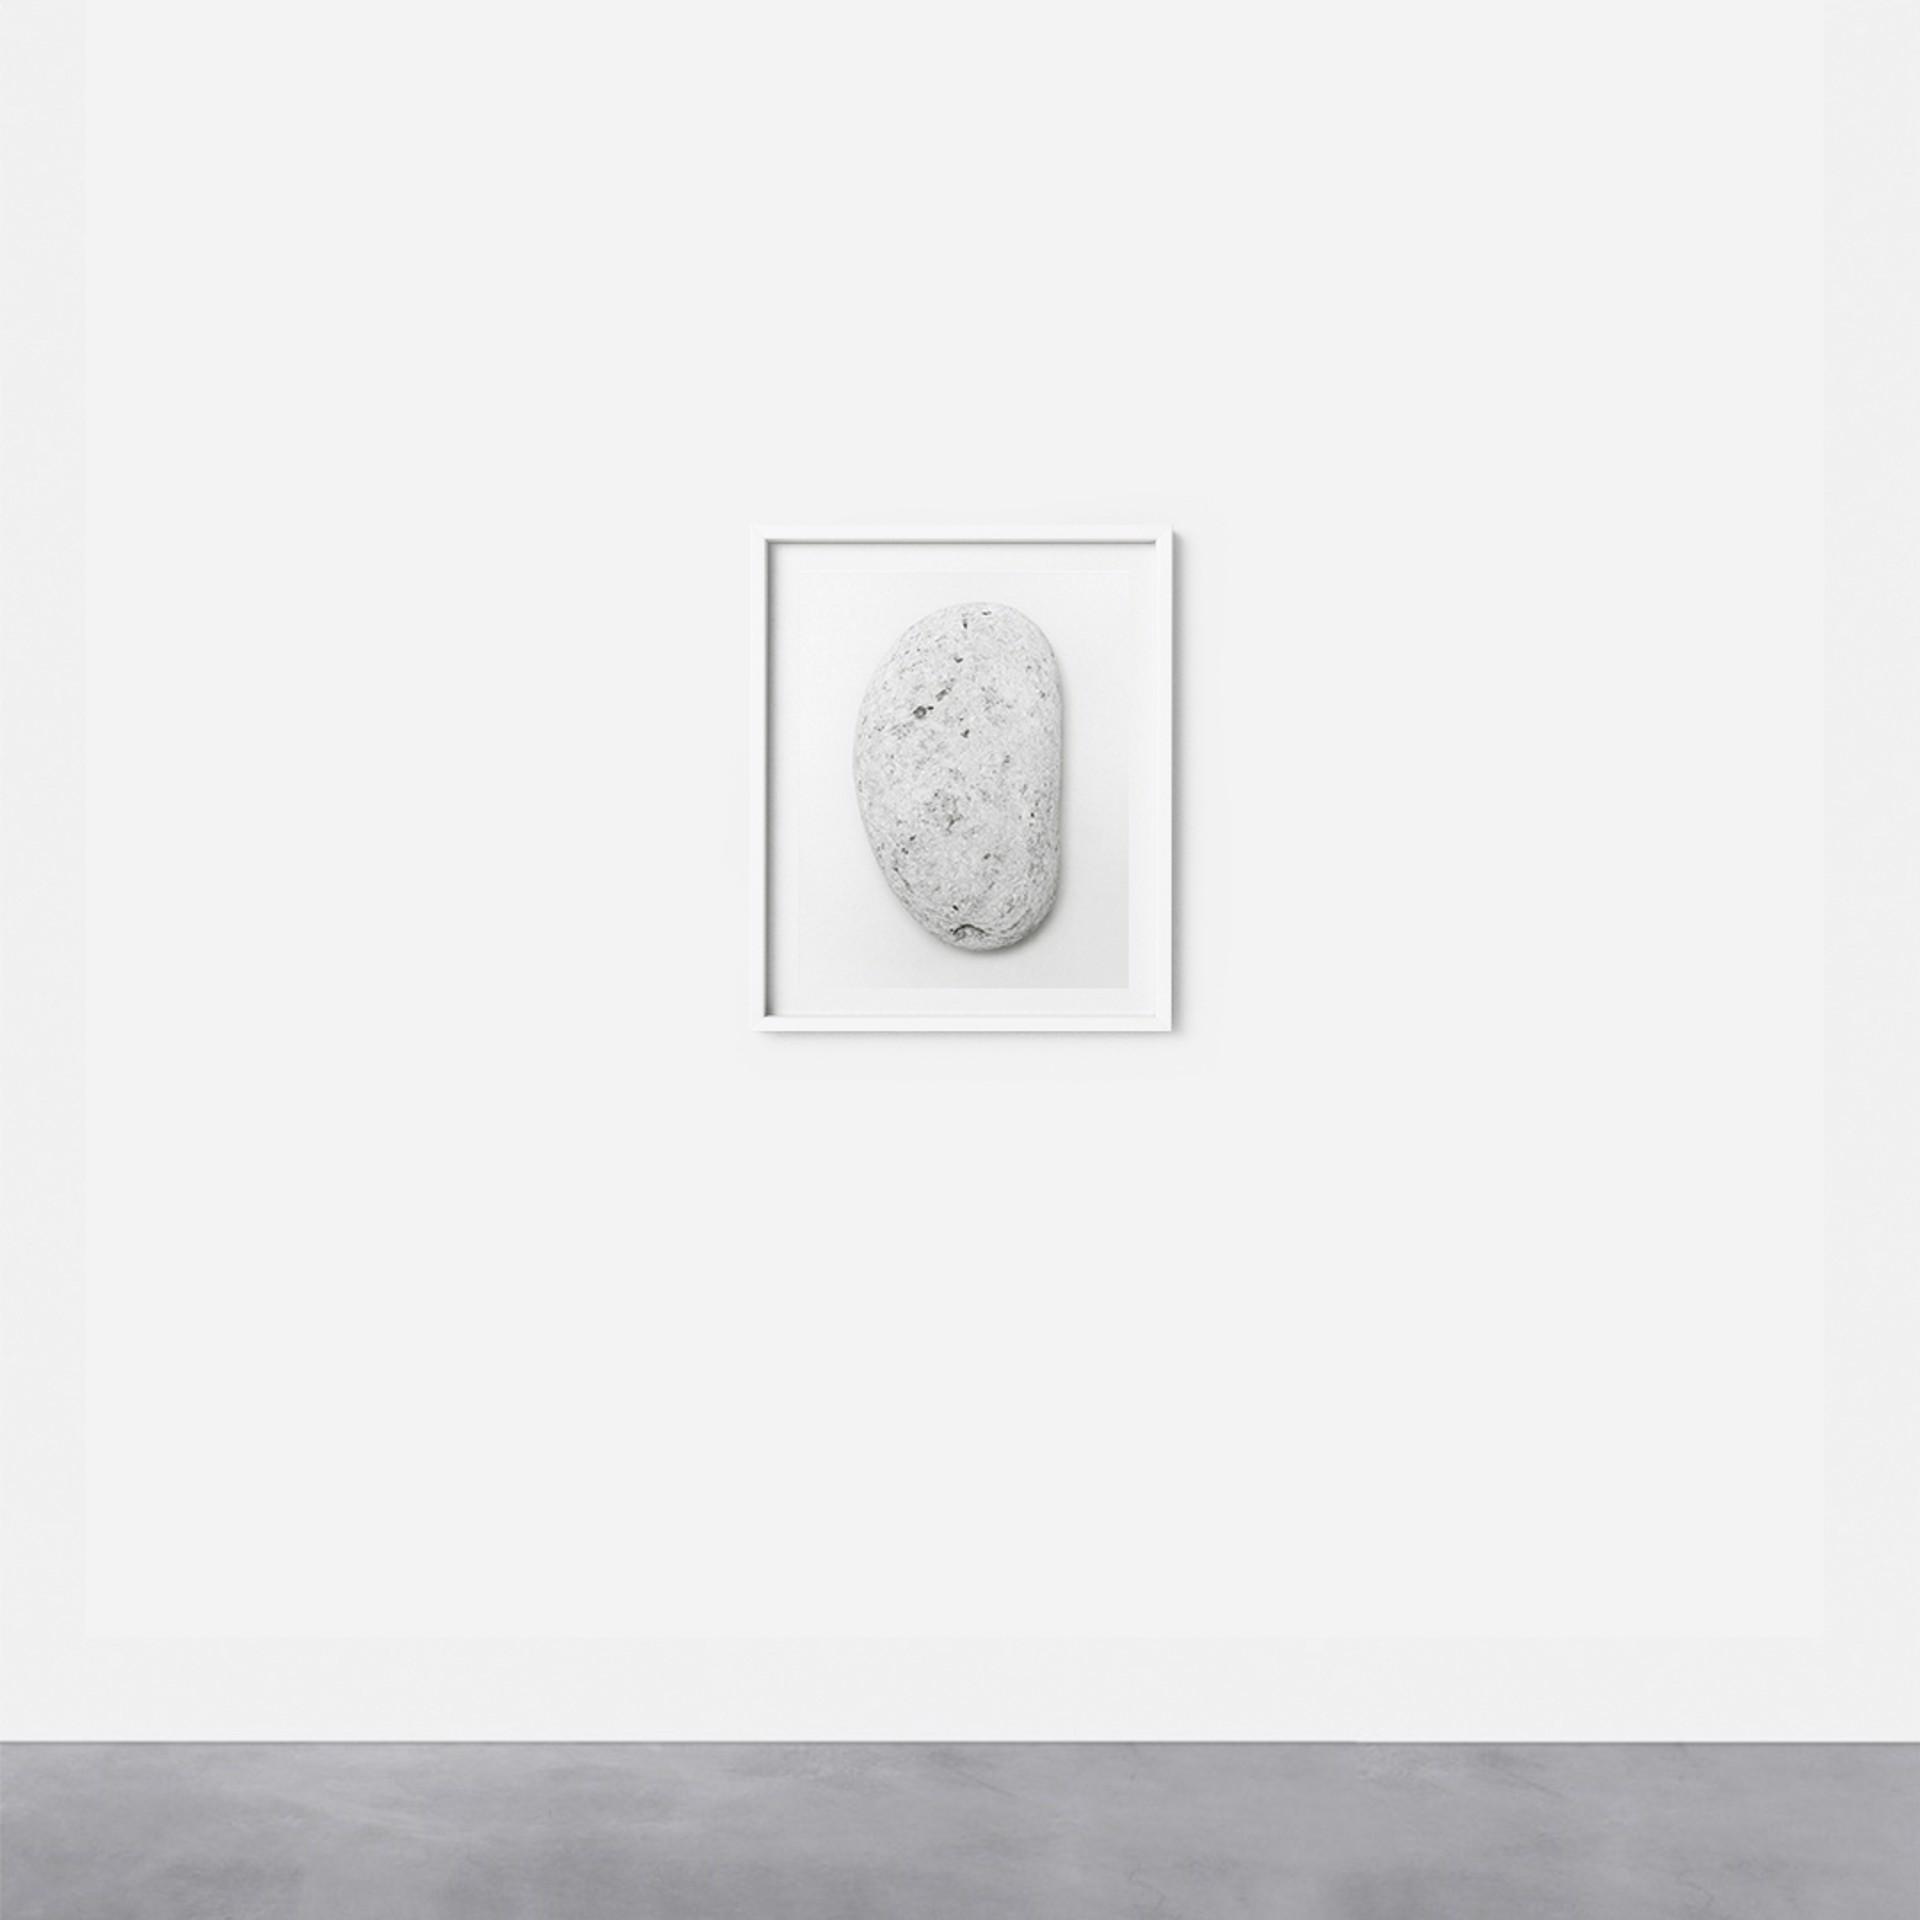 Luminous stone #13 by Gabriella Imperatori-Penn